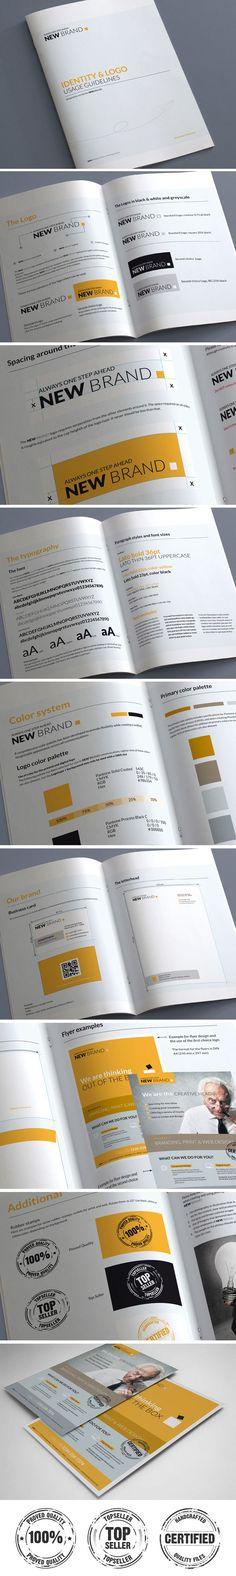 Brand Guidelines by Andrea Maisenbacher, via Behance